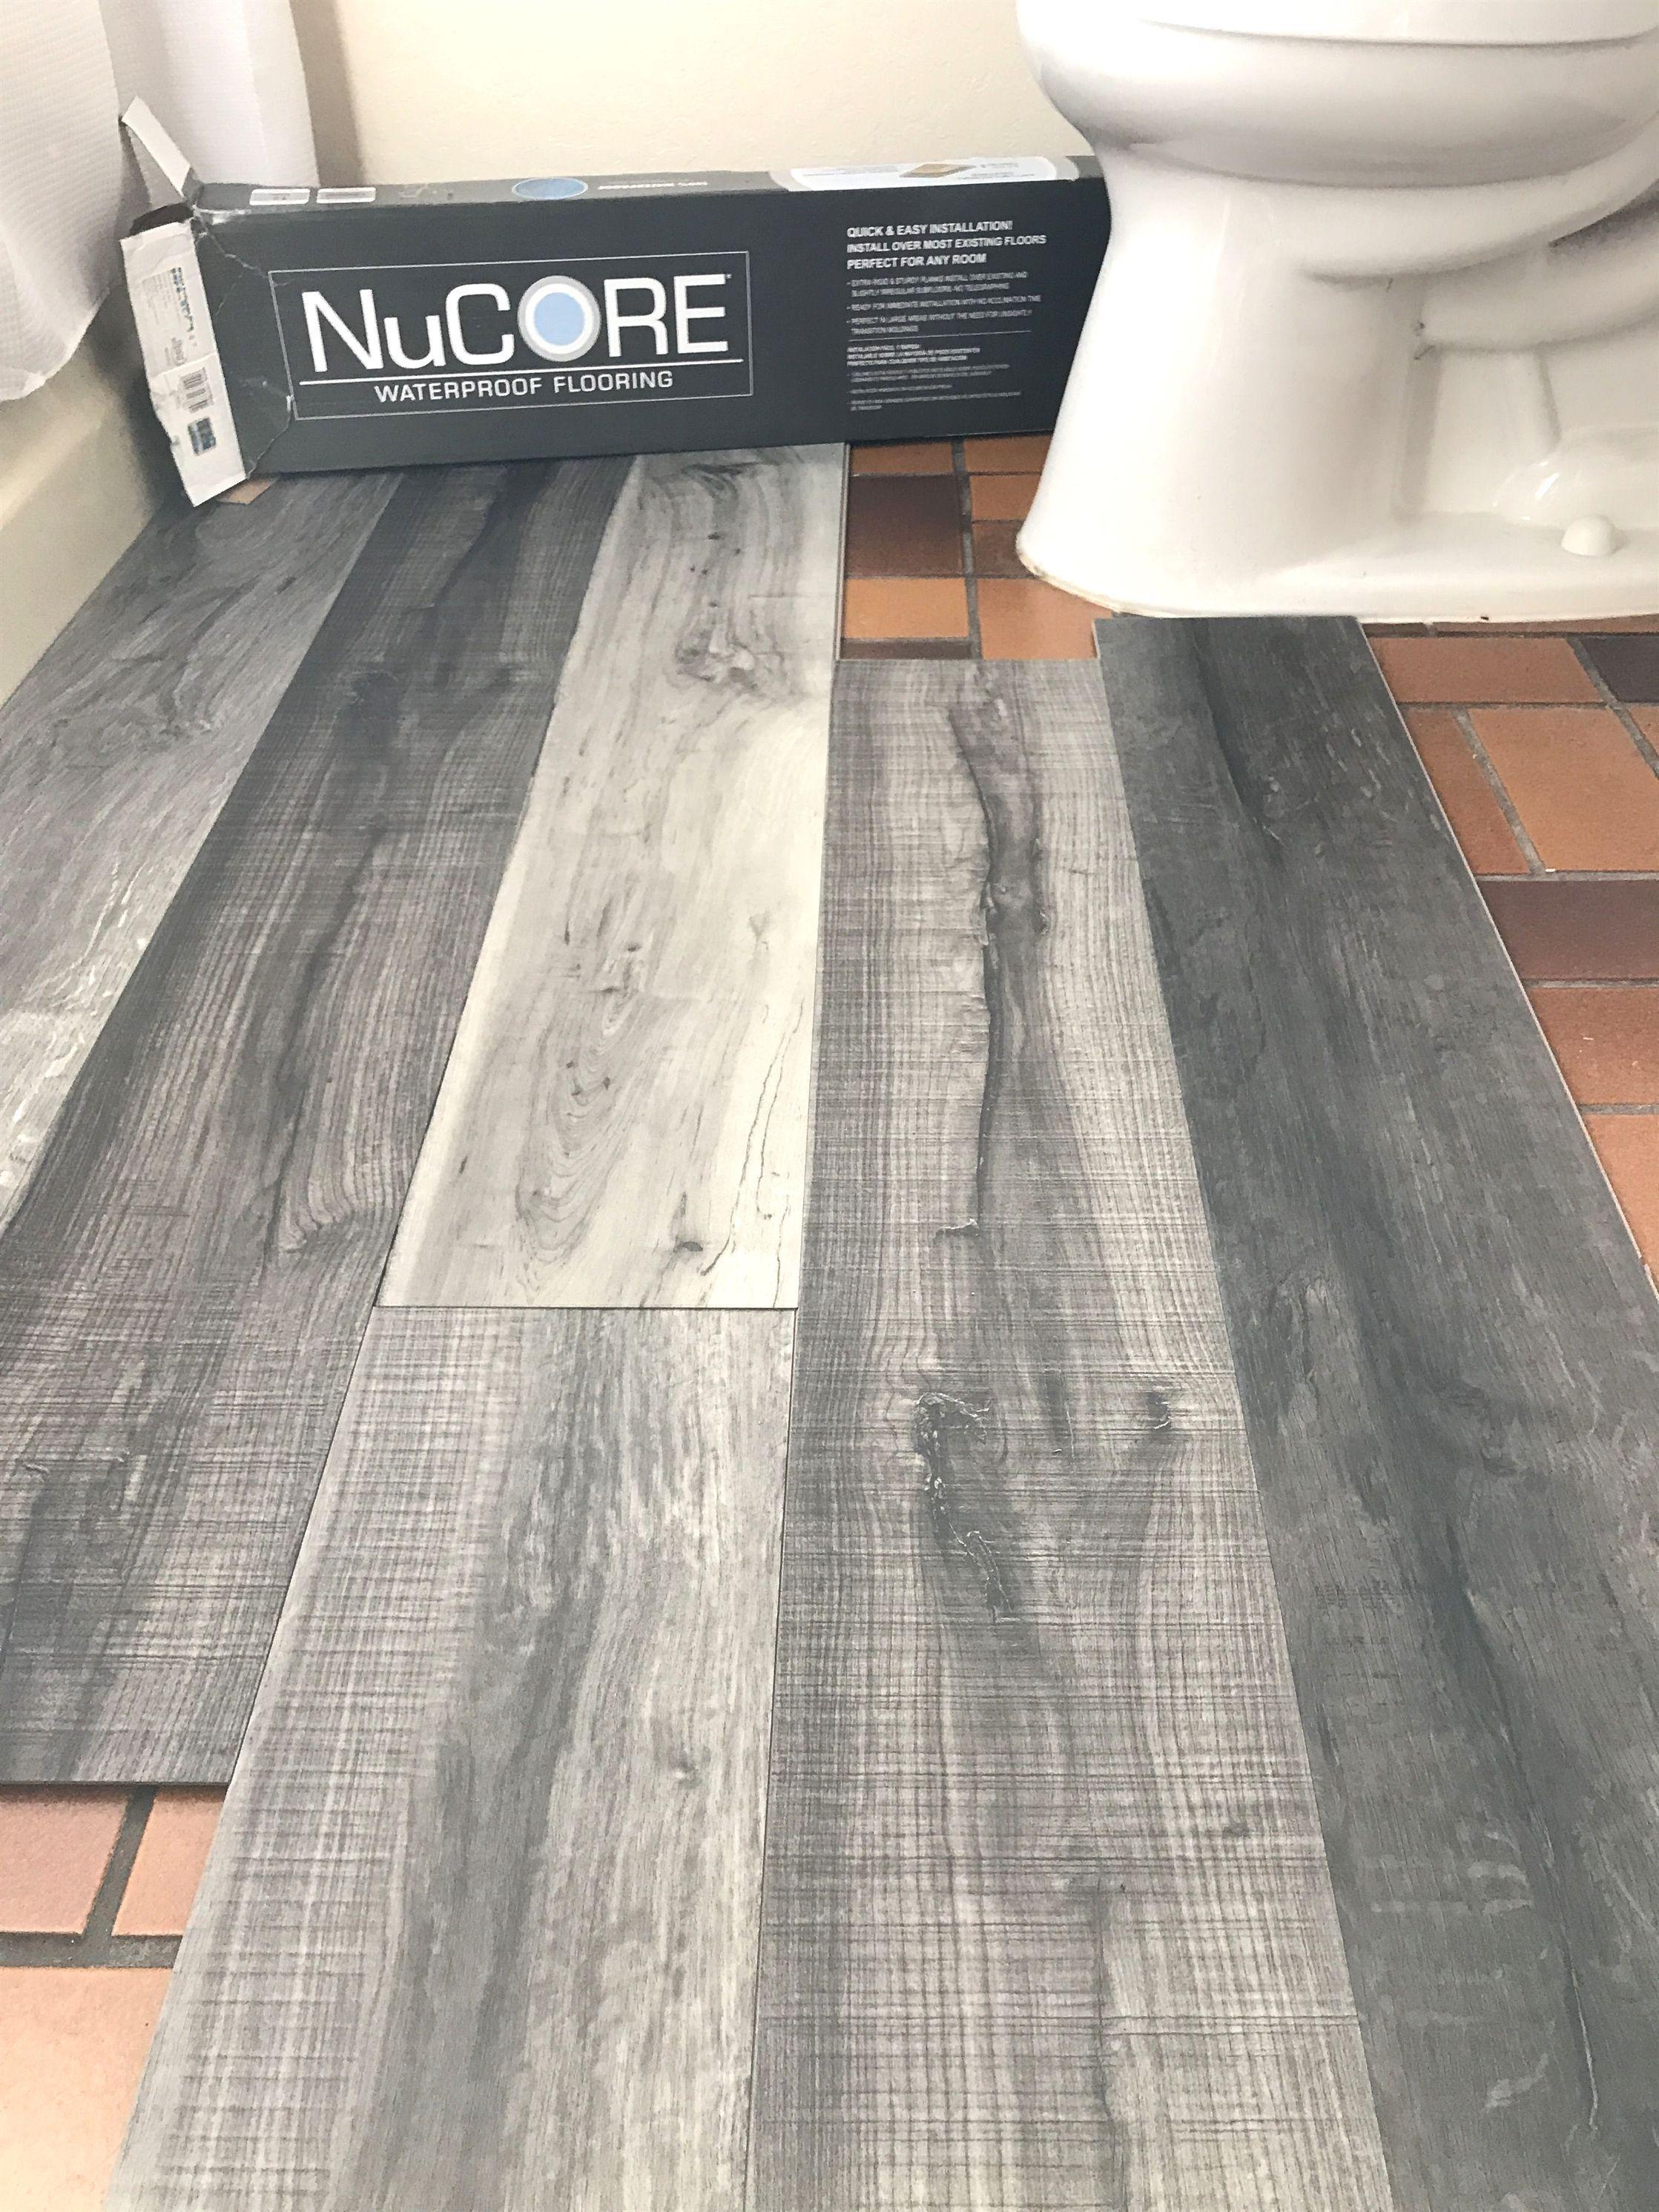 Vinyl Plank Flooring That S Waterproof Lays Right On Top Of Your Existing Flo In 2020 Toilet And Bathroom Design Grey Vinyl Plank Flooring Allure Vinyl Plank Flooring